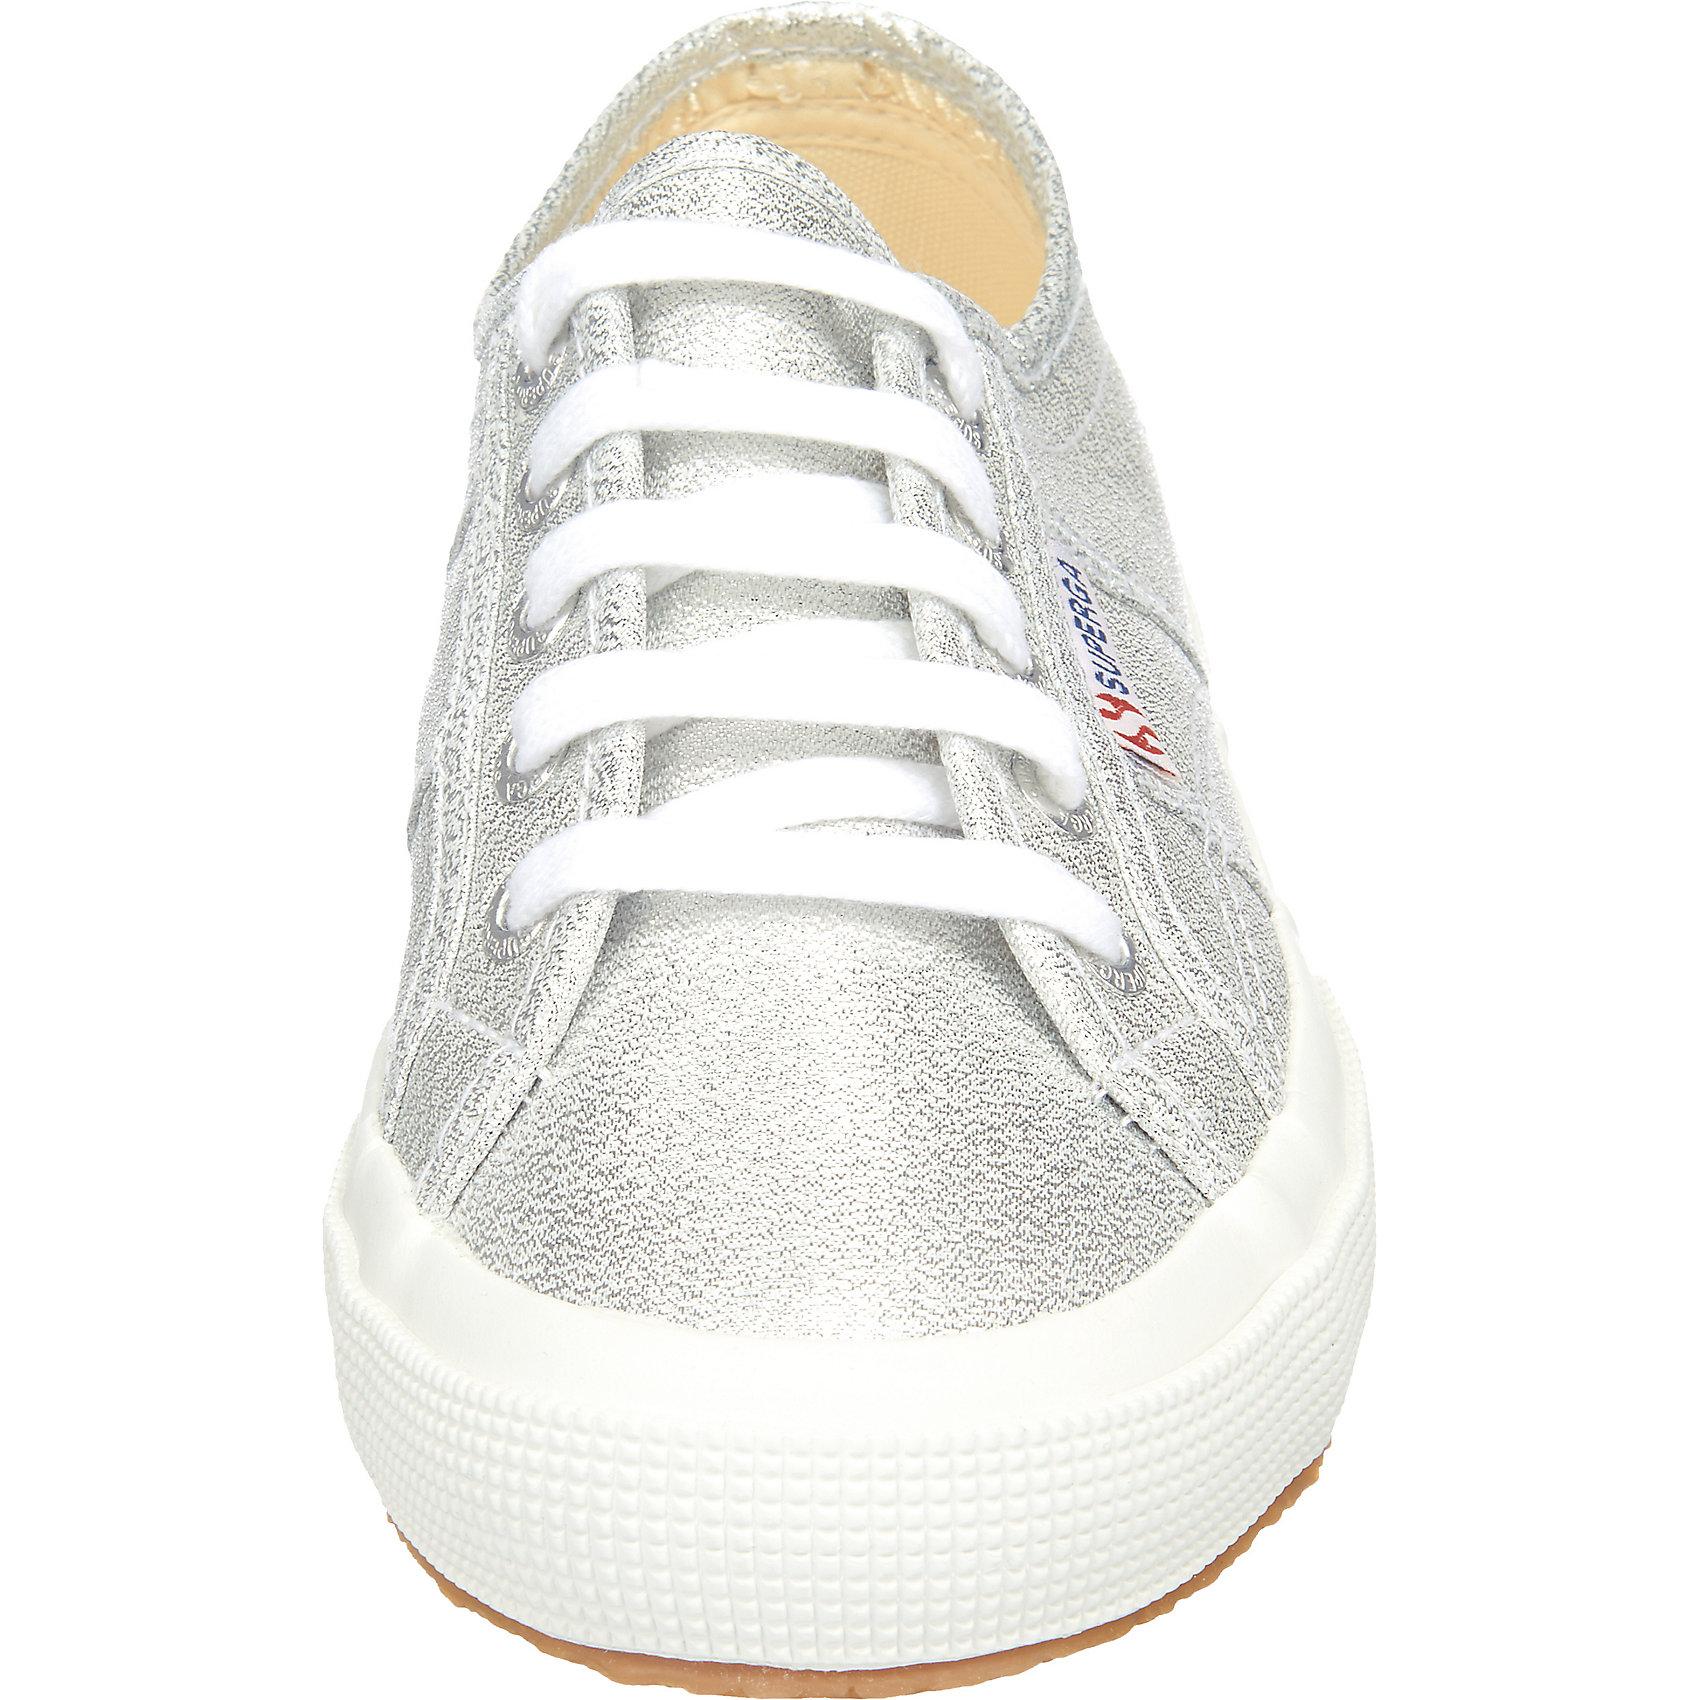 timeless design 13e5d 00fc8 ... Nike SB Hyperfeel Koston 3 - Black Black Black   White Size 10.5 New  1917ff ...